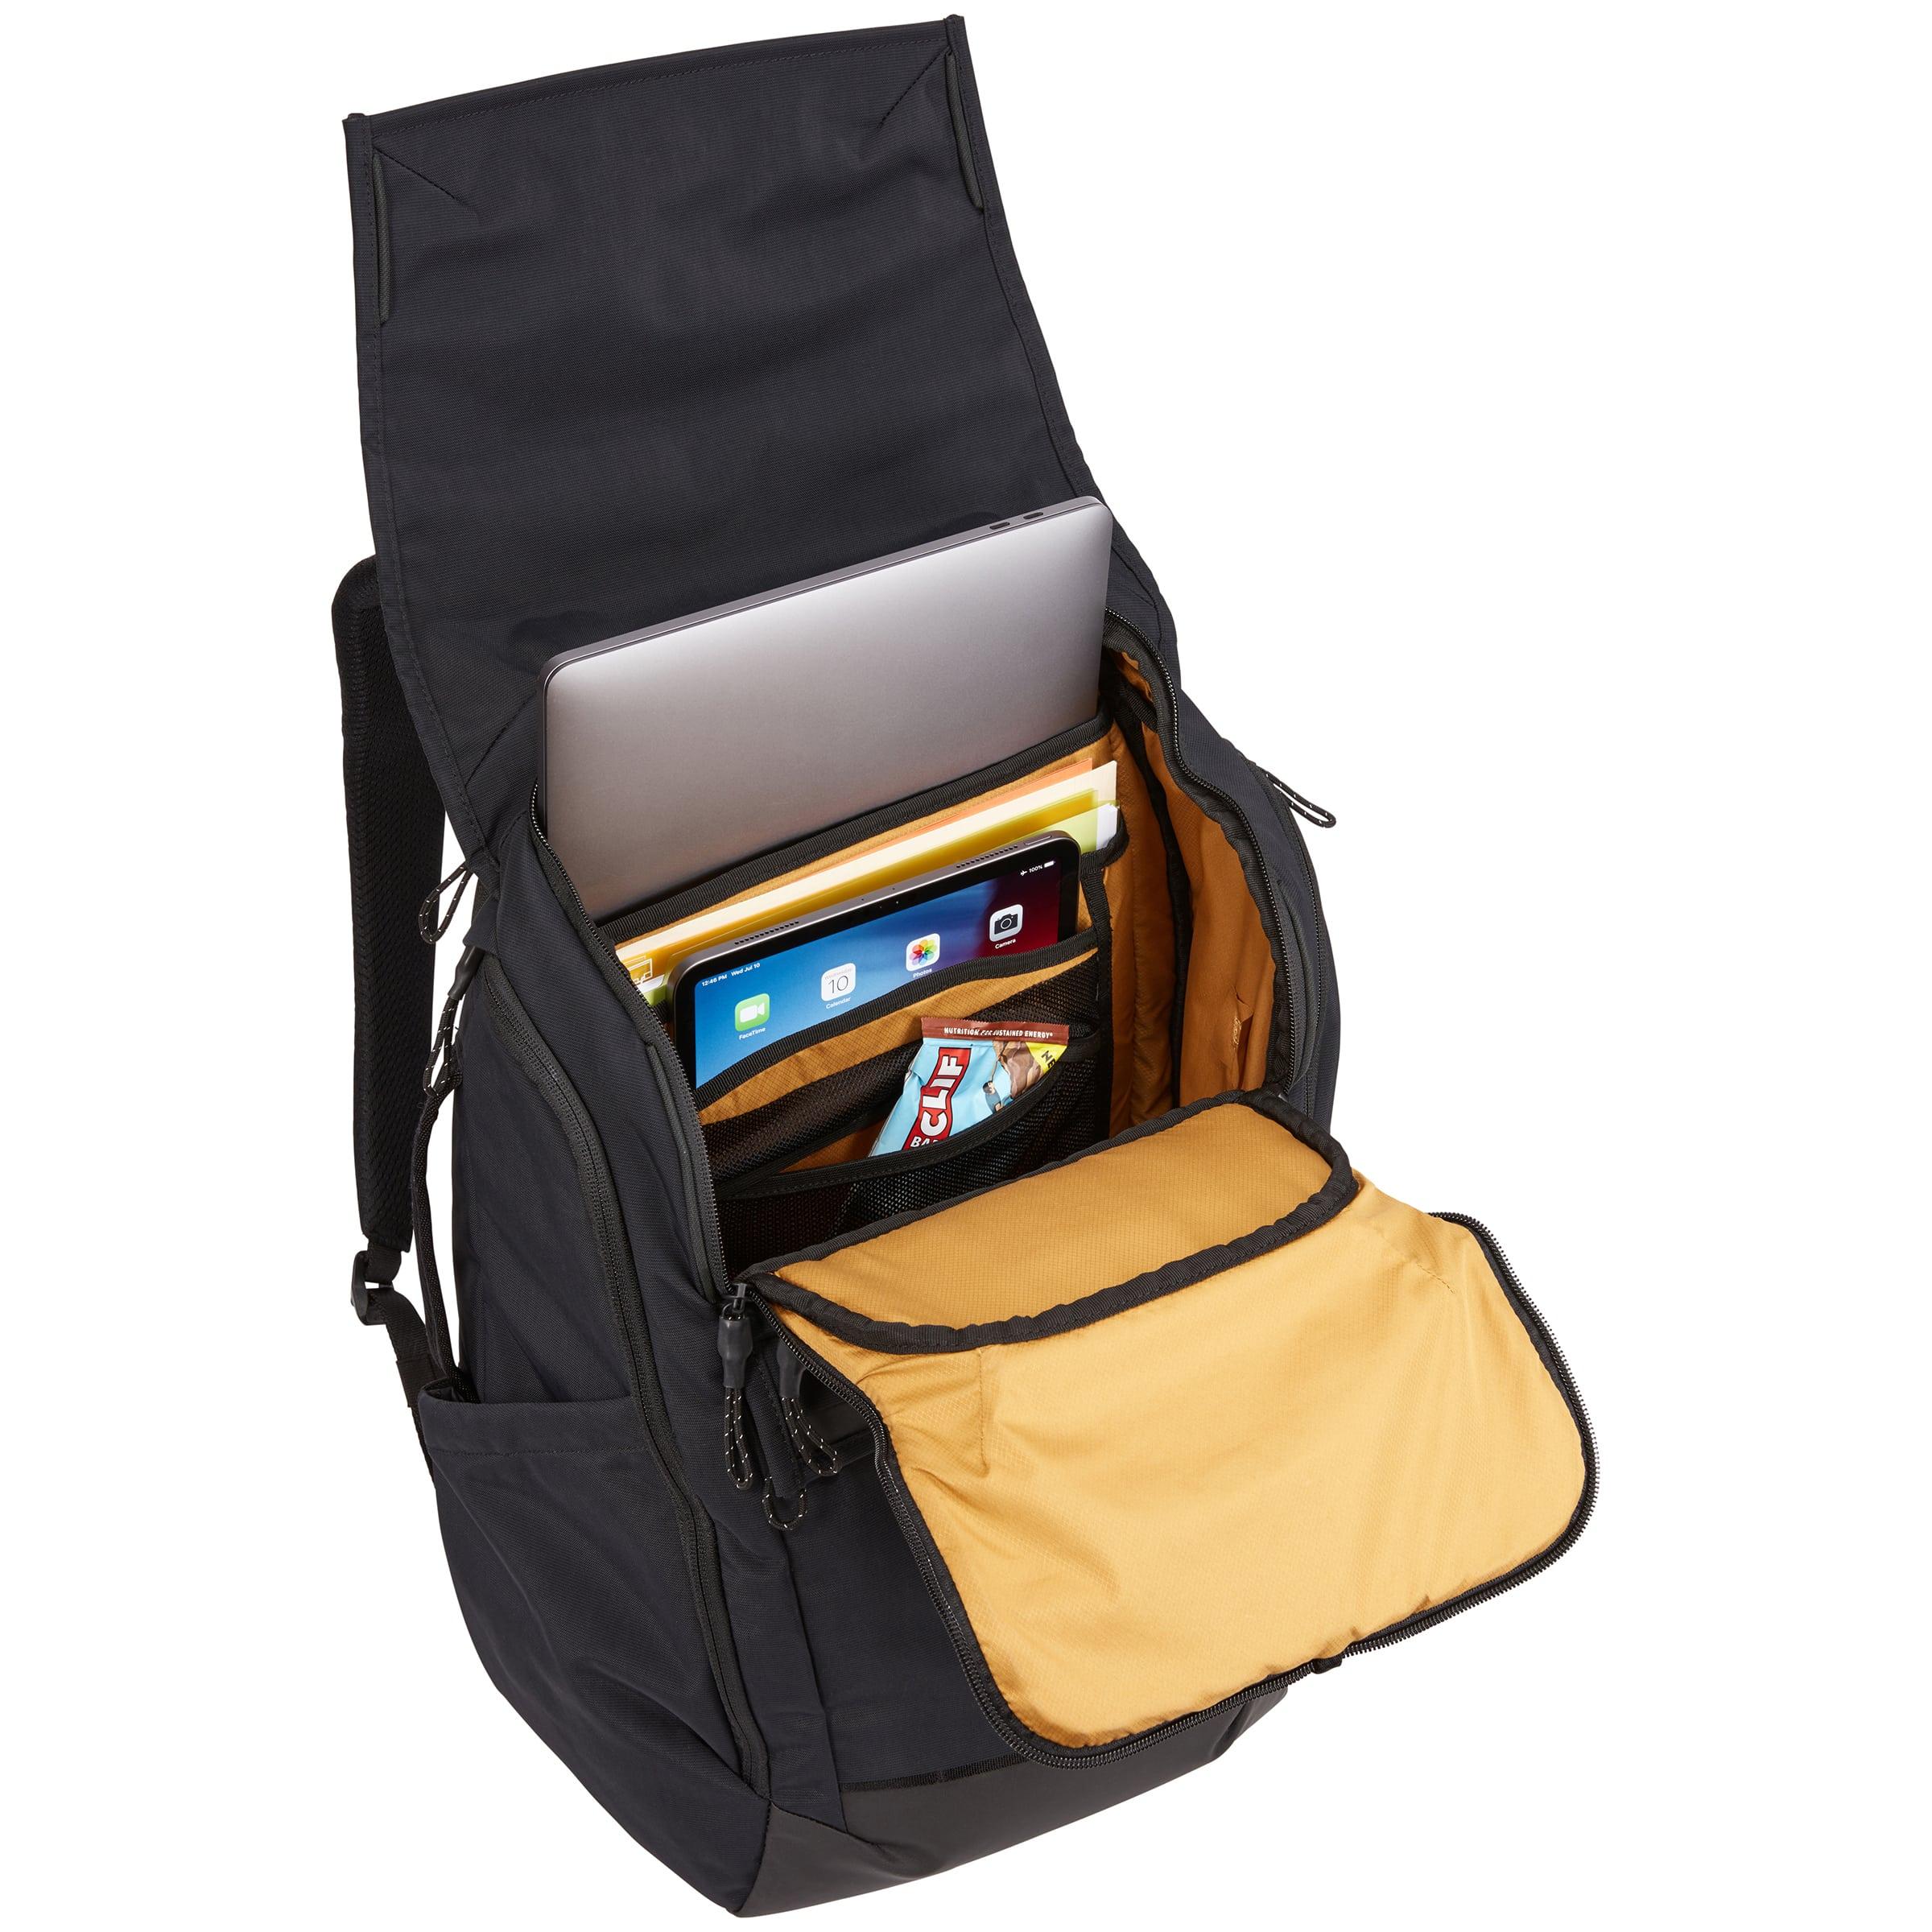 File name: paramount-backpack-27l-black-3.jpg Dimensions: 2400 x 2400 pixels File size: 380.51 KB